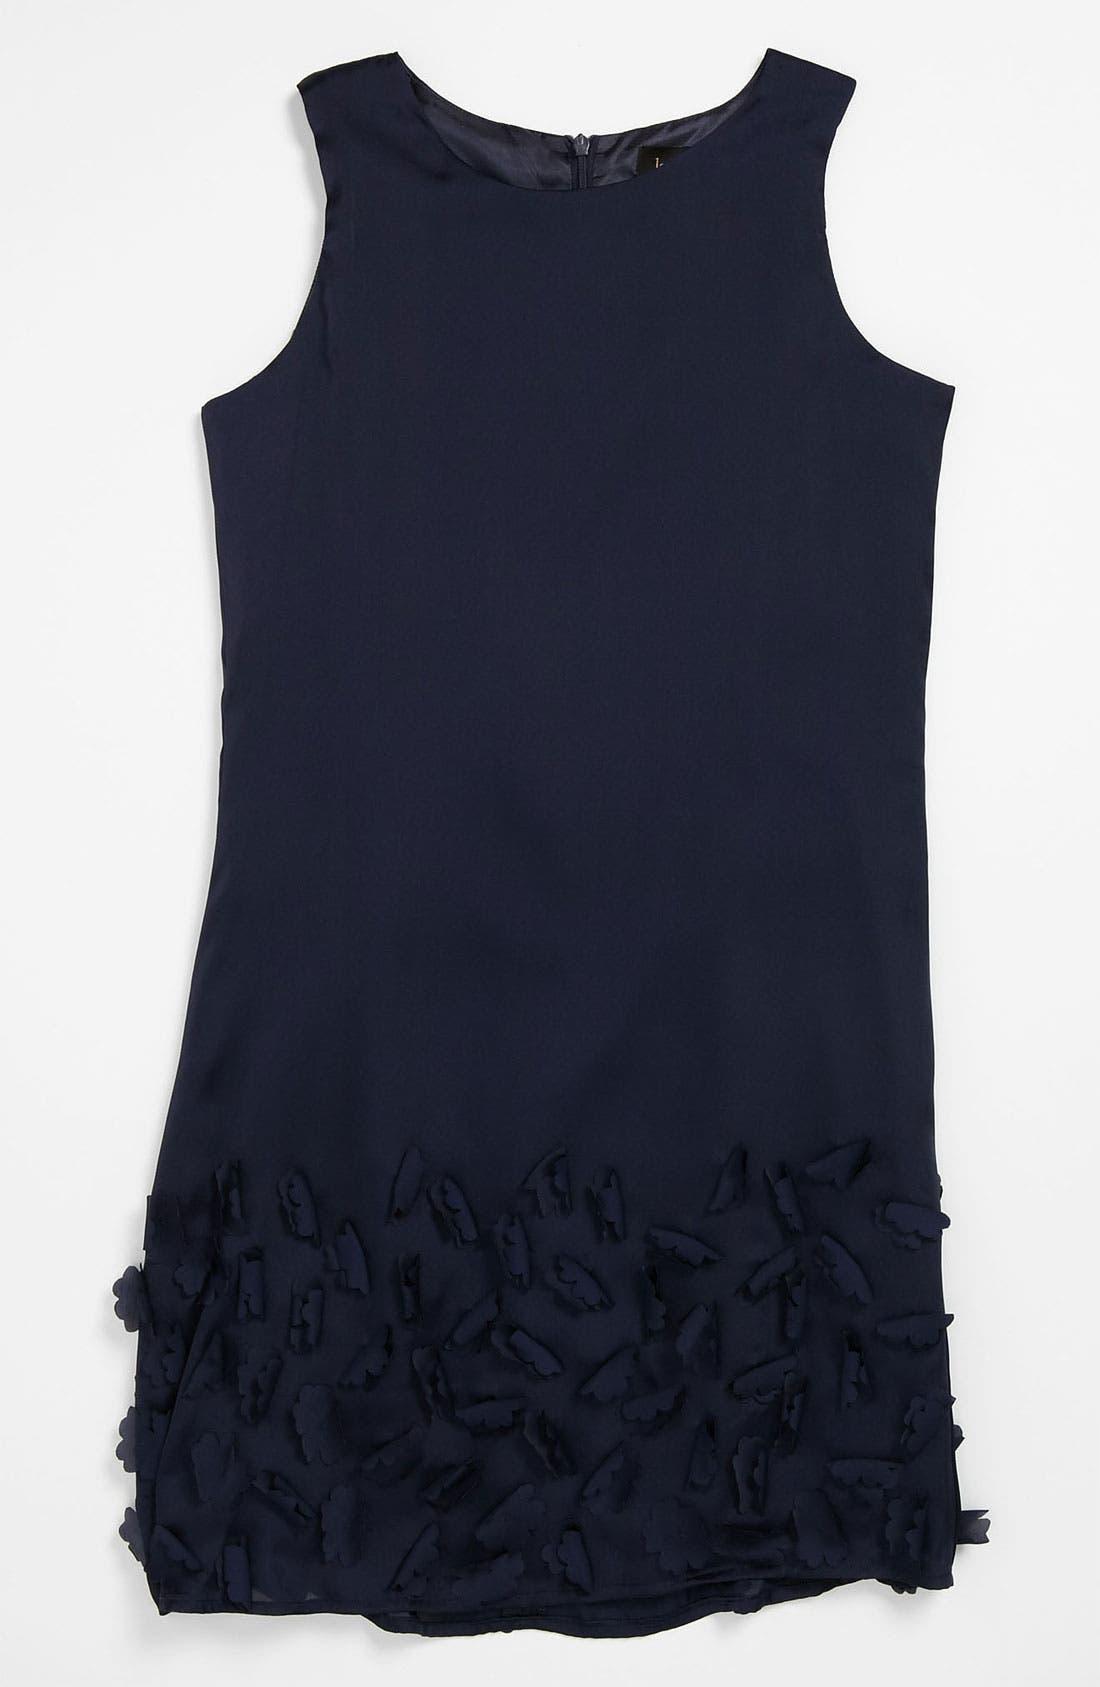 Main Image - Laundry by Shelli Segal 'Betsy' Dress (Big Girls)